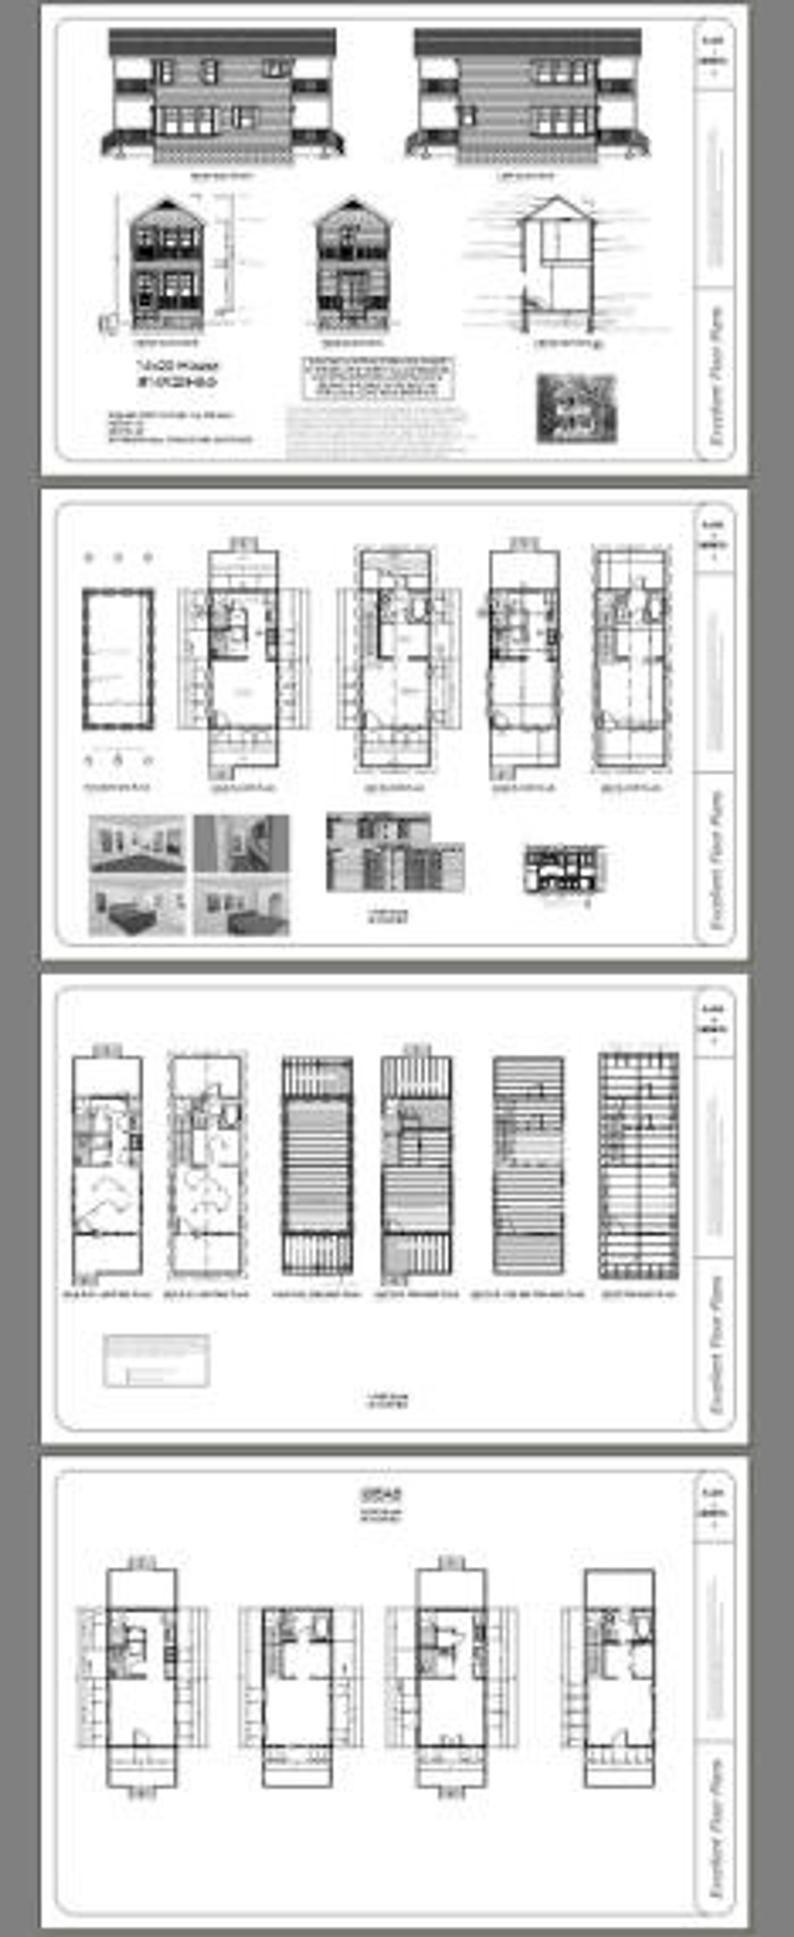 14x28 House 1Bedroom 1.5Bath 749 sq ft PDF